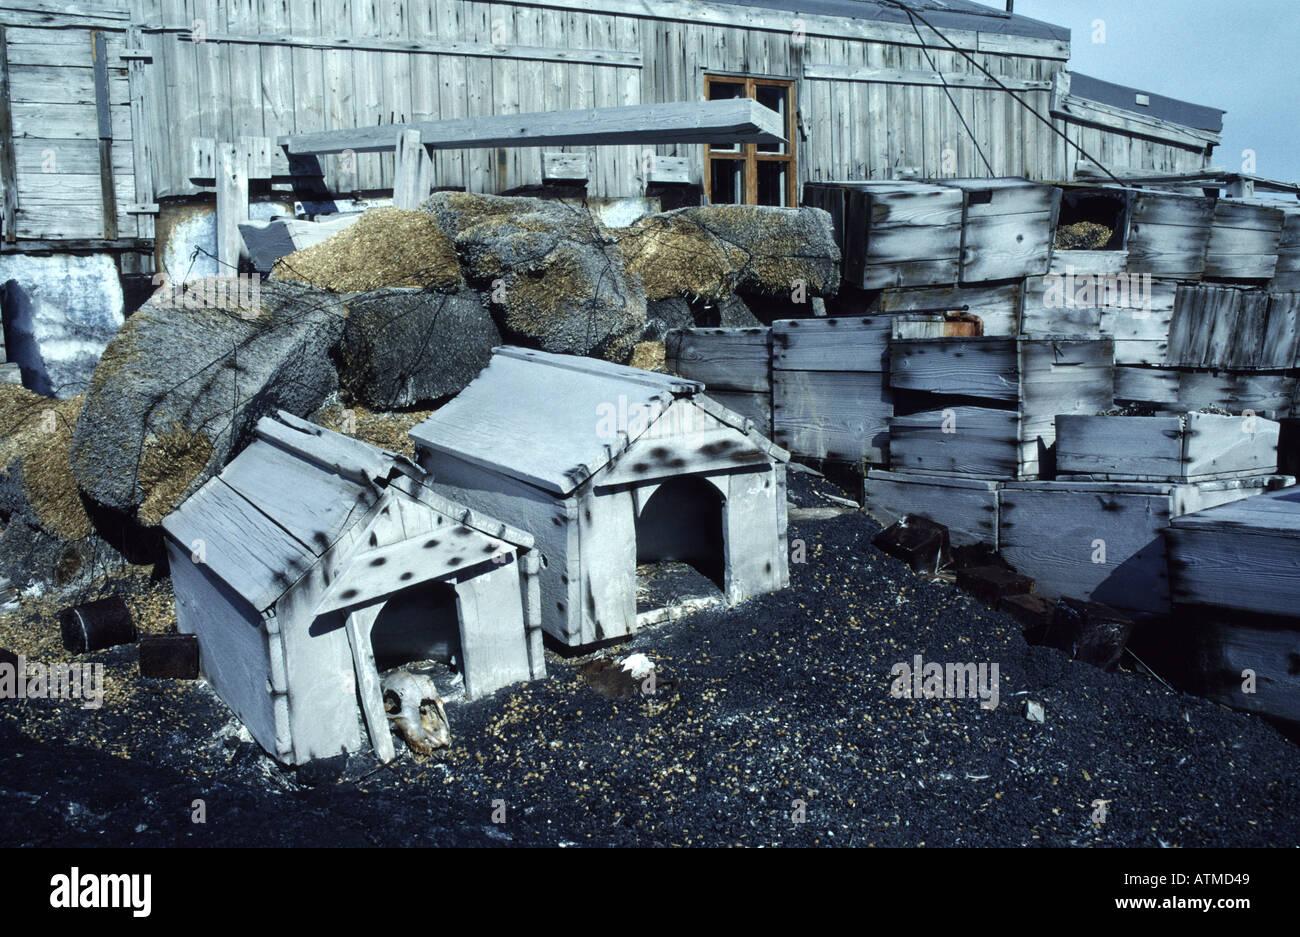 Dog kennels outside Shackletons historic hut Cape Royds Ross Island Antarctica - Stock Image